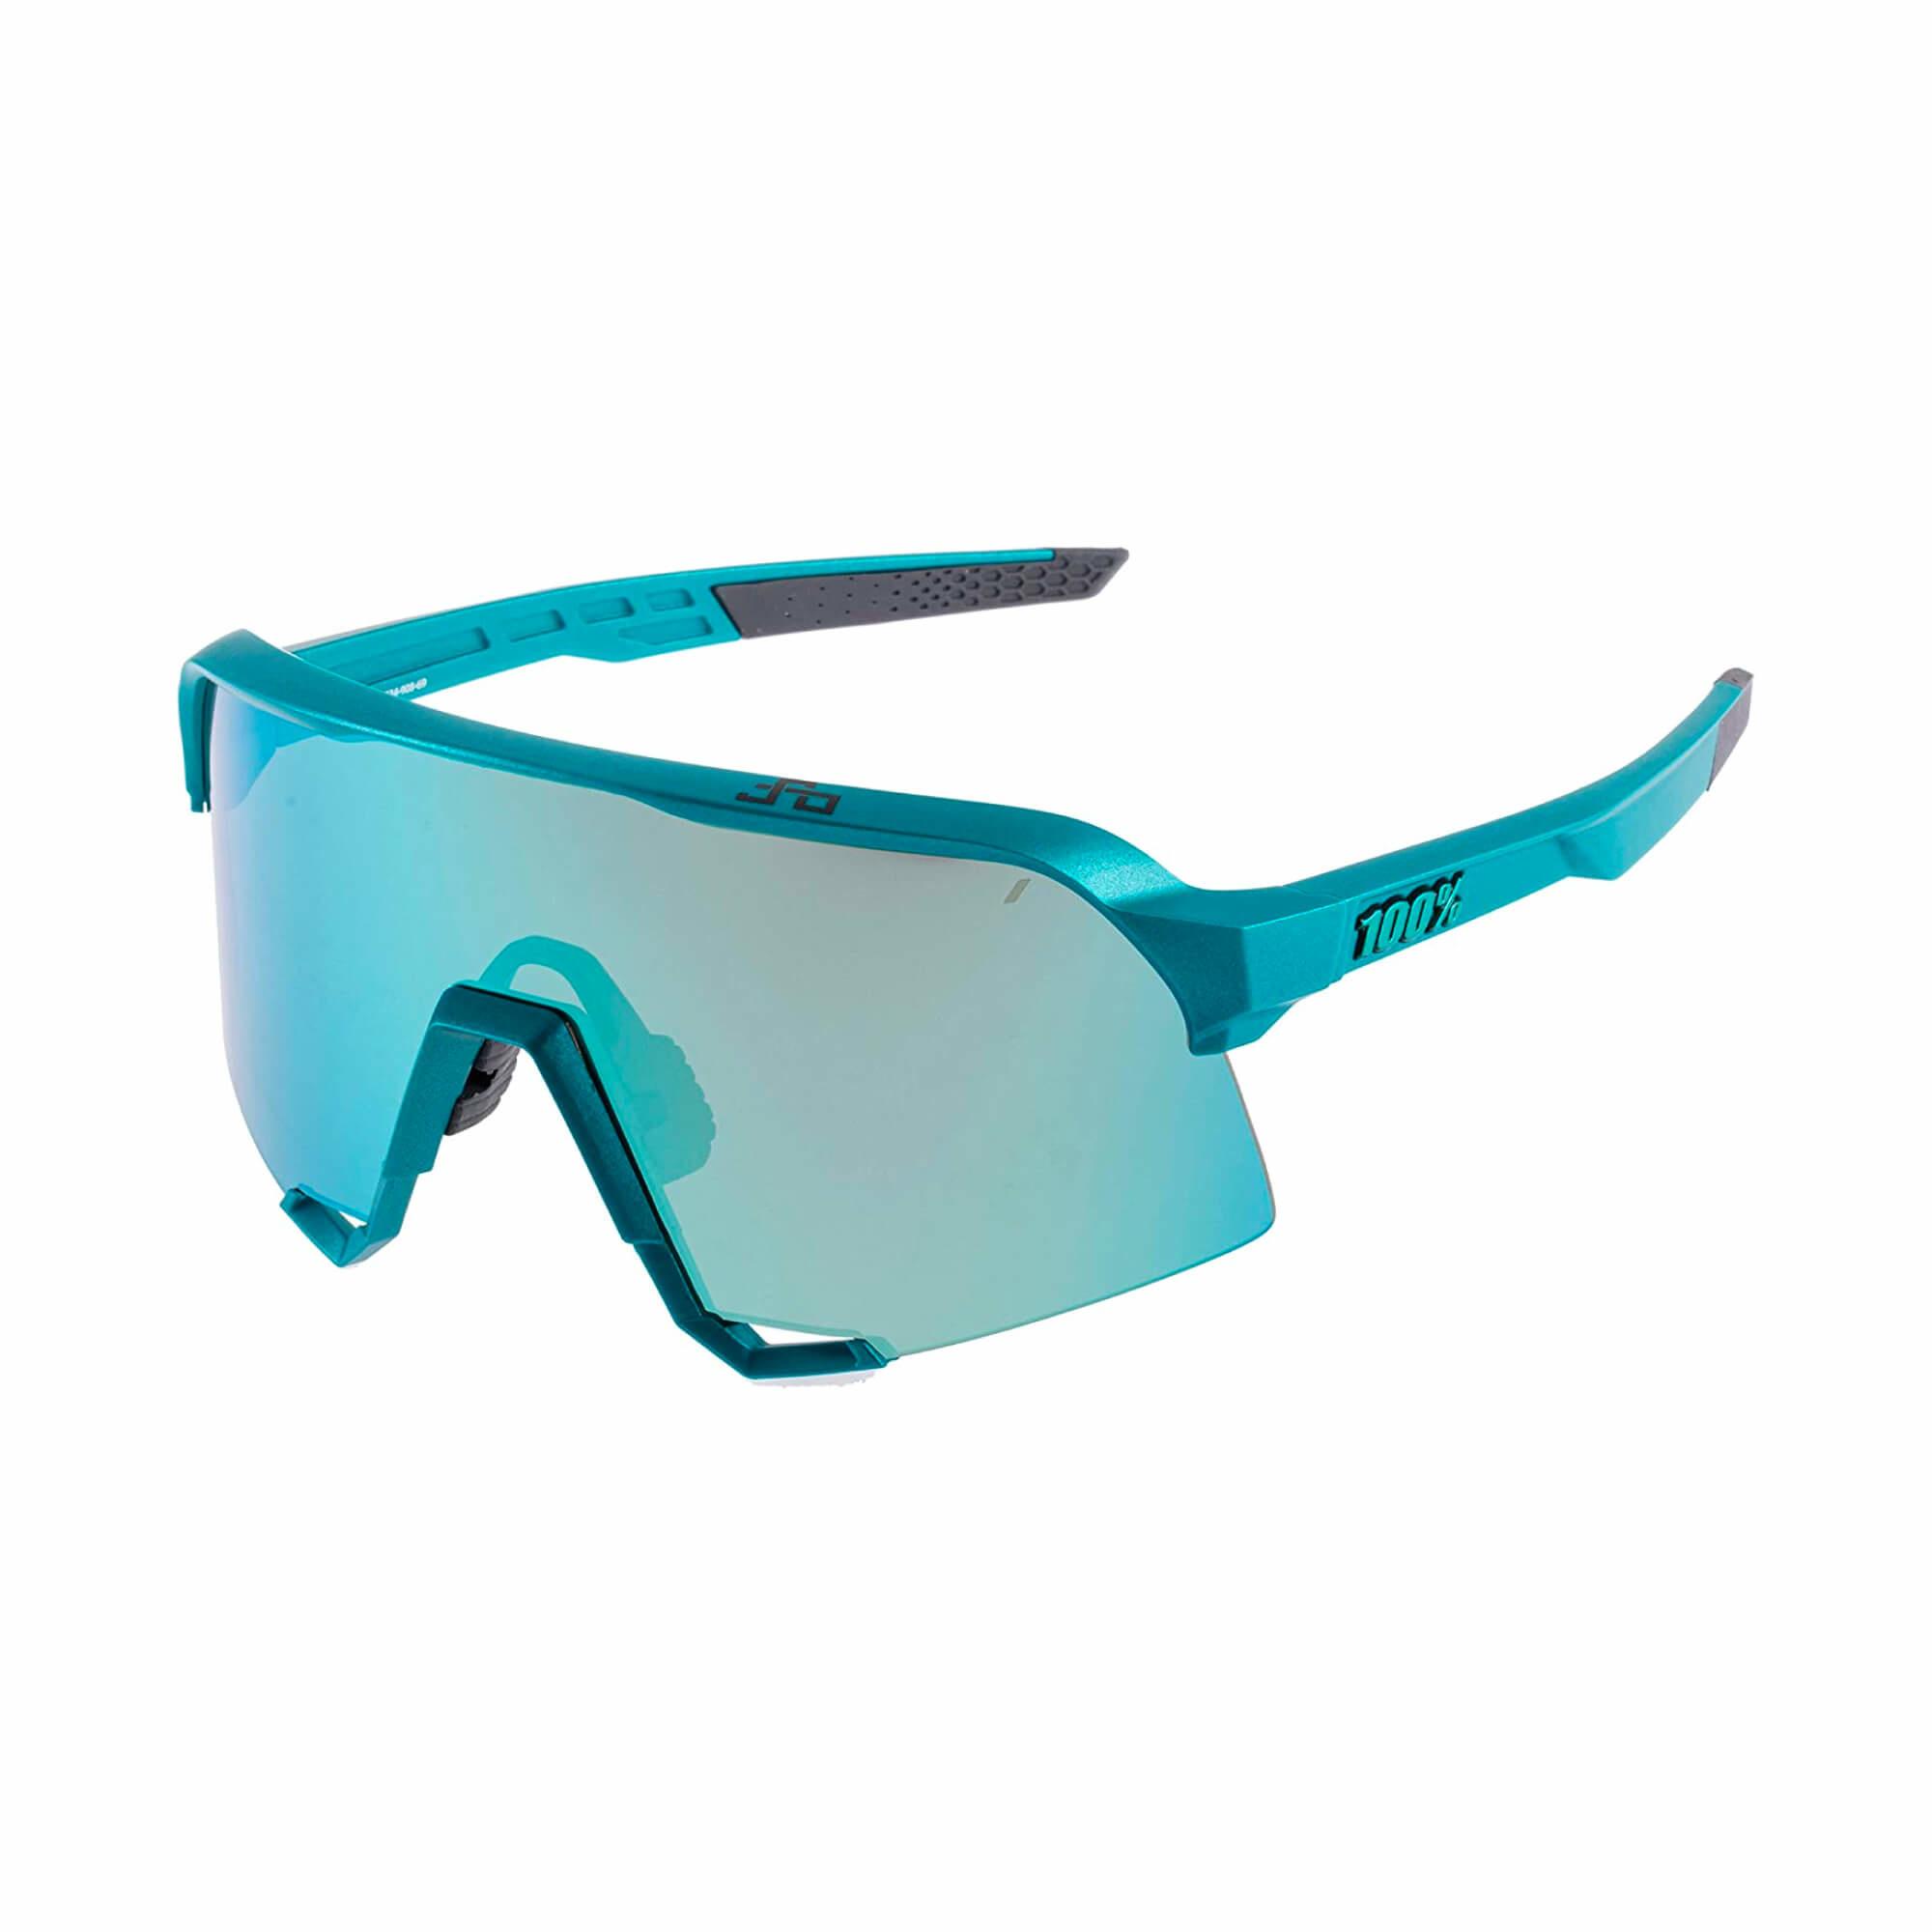 S3 Peter Sagan Limited Edition Blue Topaz Multilayer Mirror Lens-1